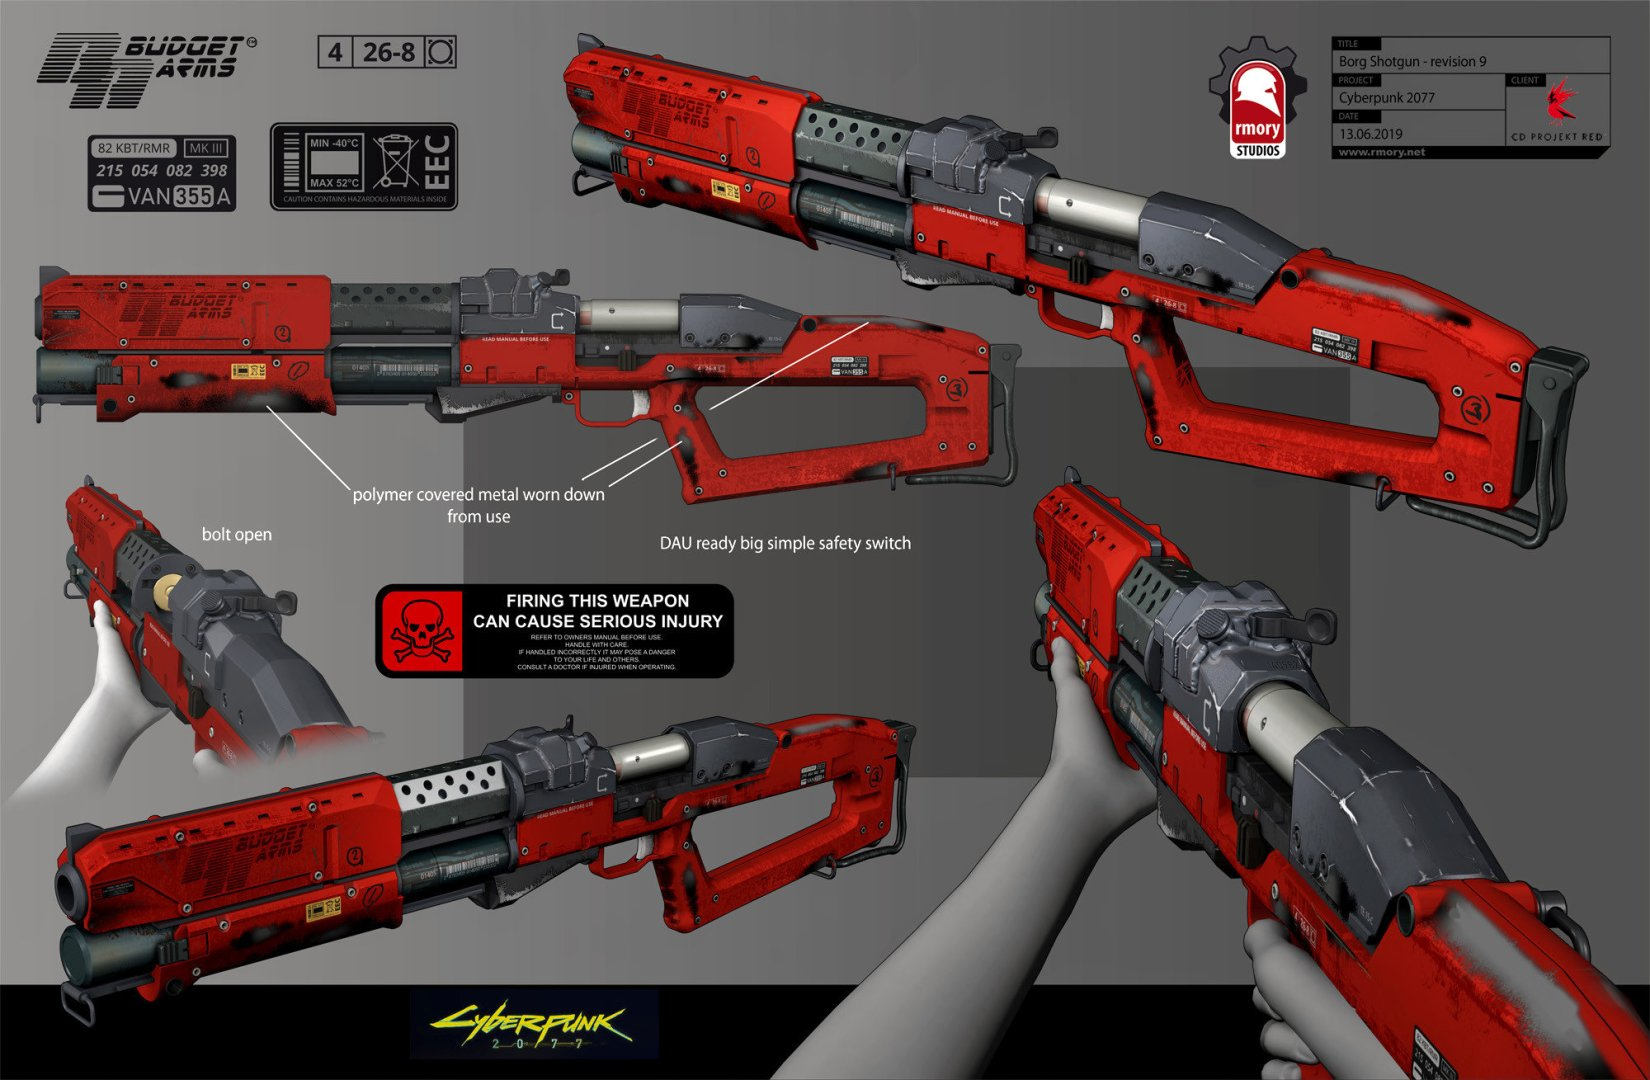 Quelle: Artstation - Kris Thaler - Cyberpunk 2077 Borg Shotgun